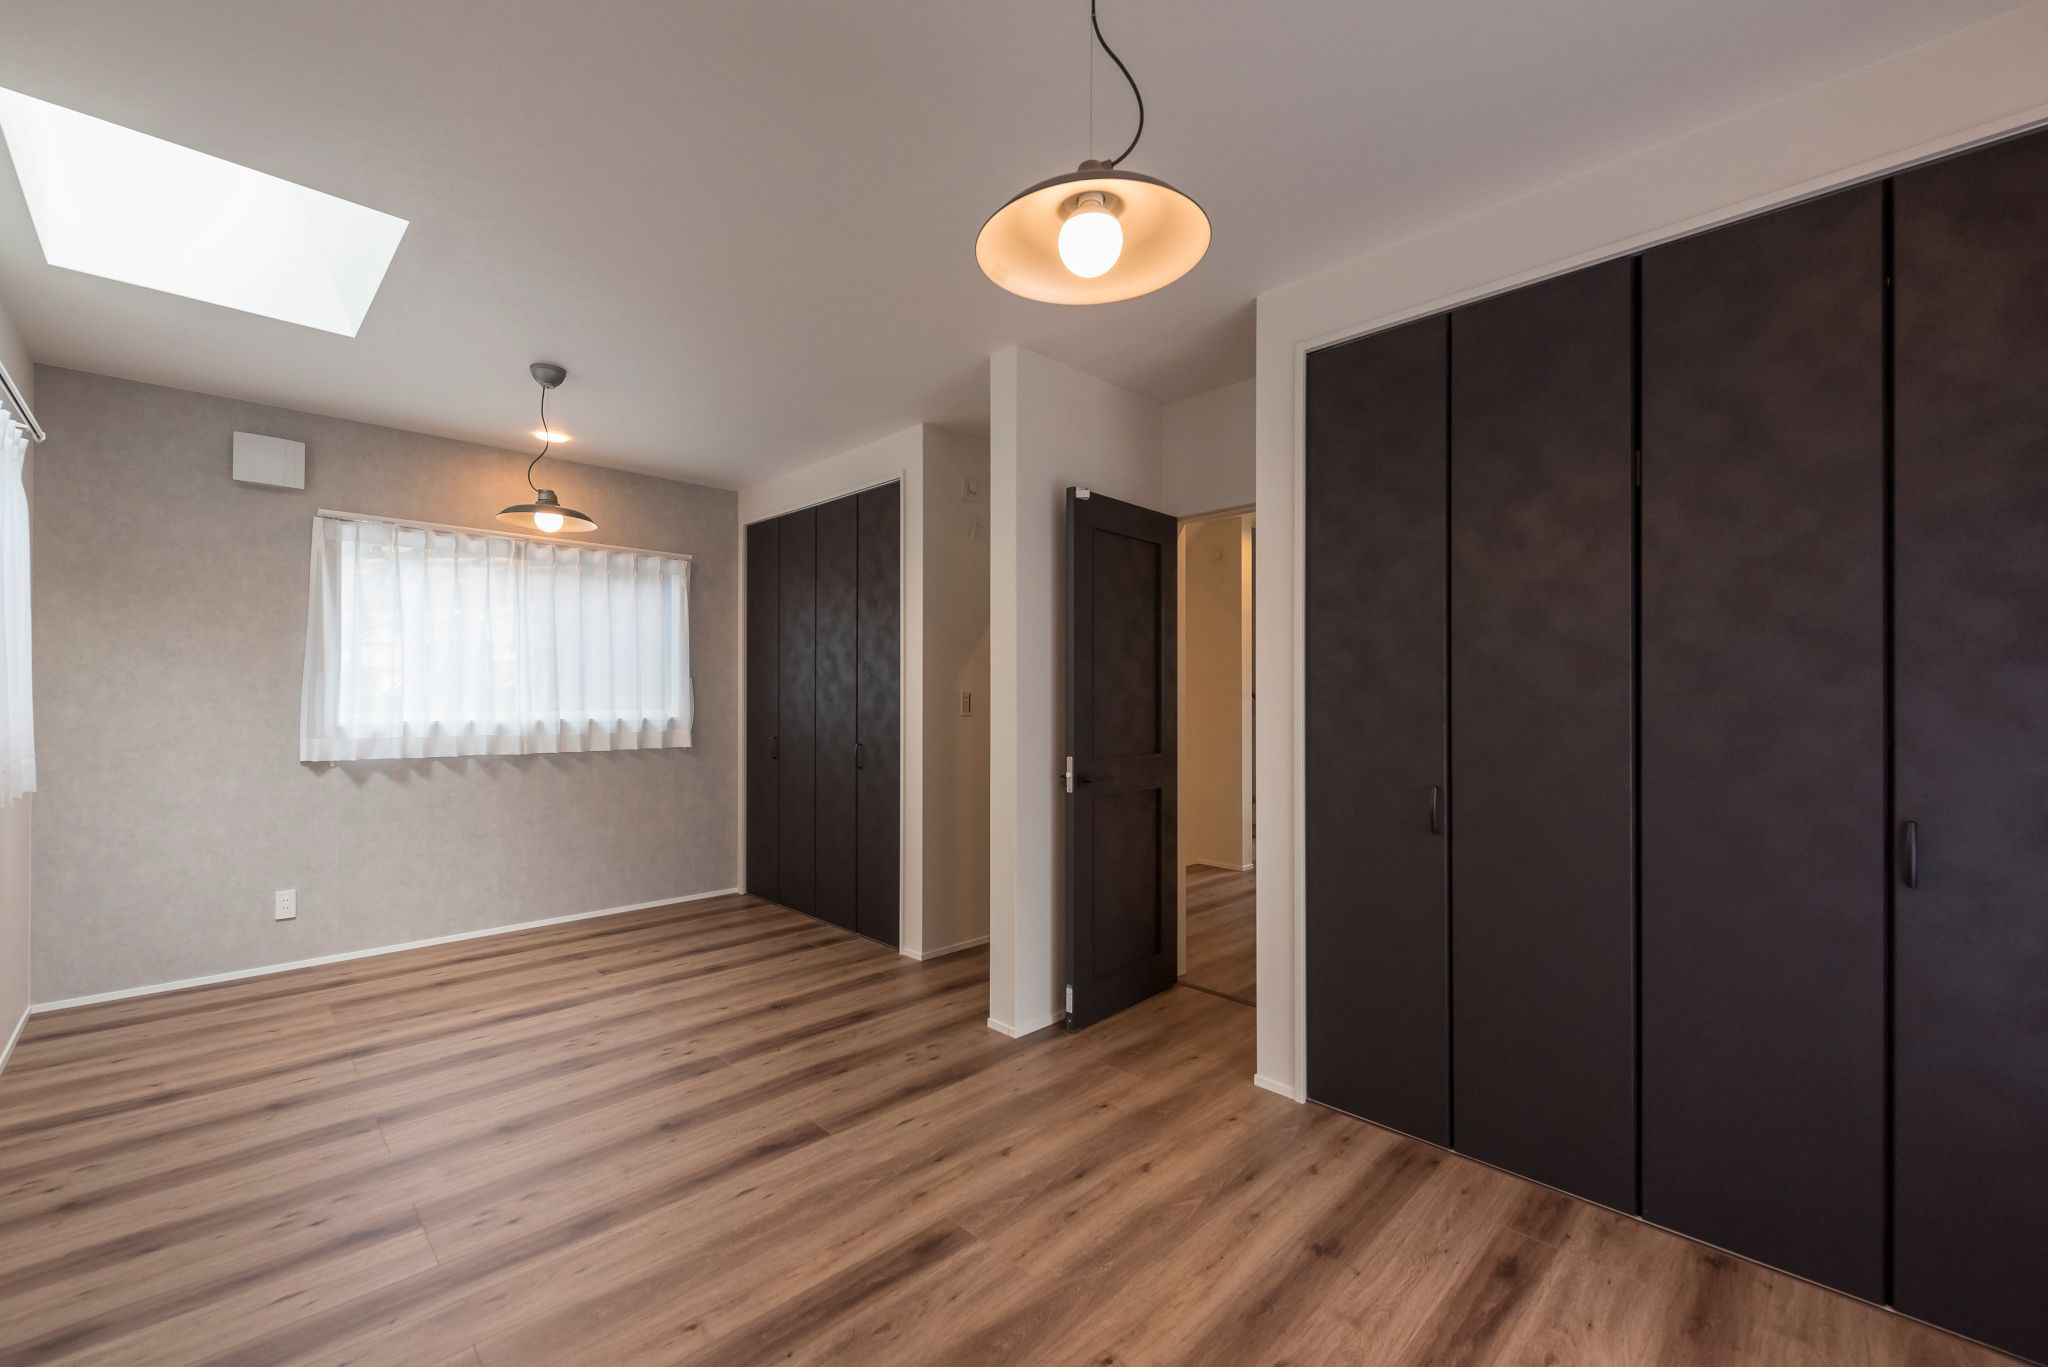 清水区 駿河区 葵区 静岡市 三和建設 新築 オープンハウス 子供部屋